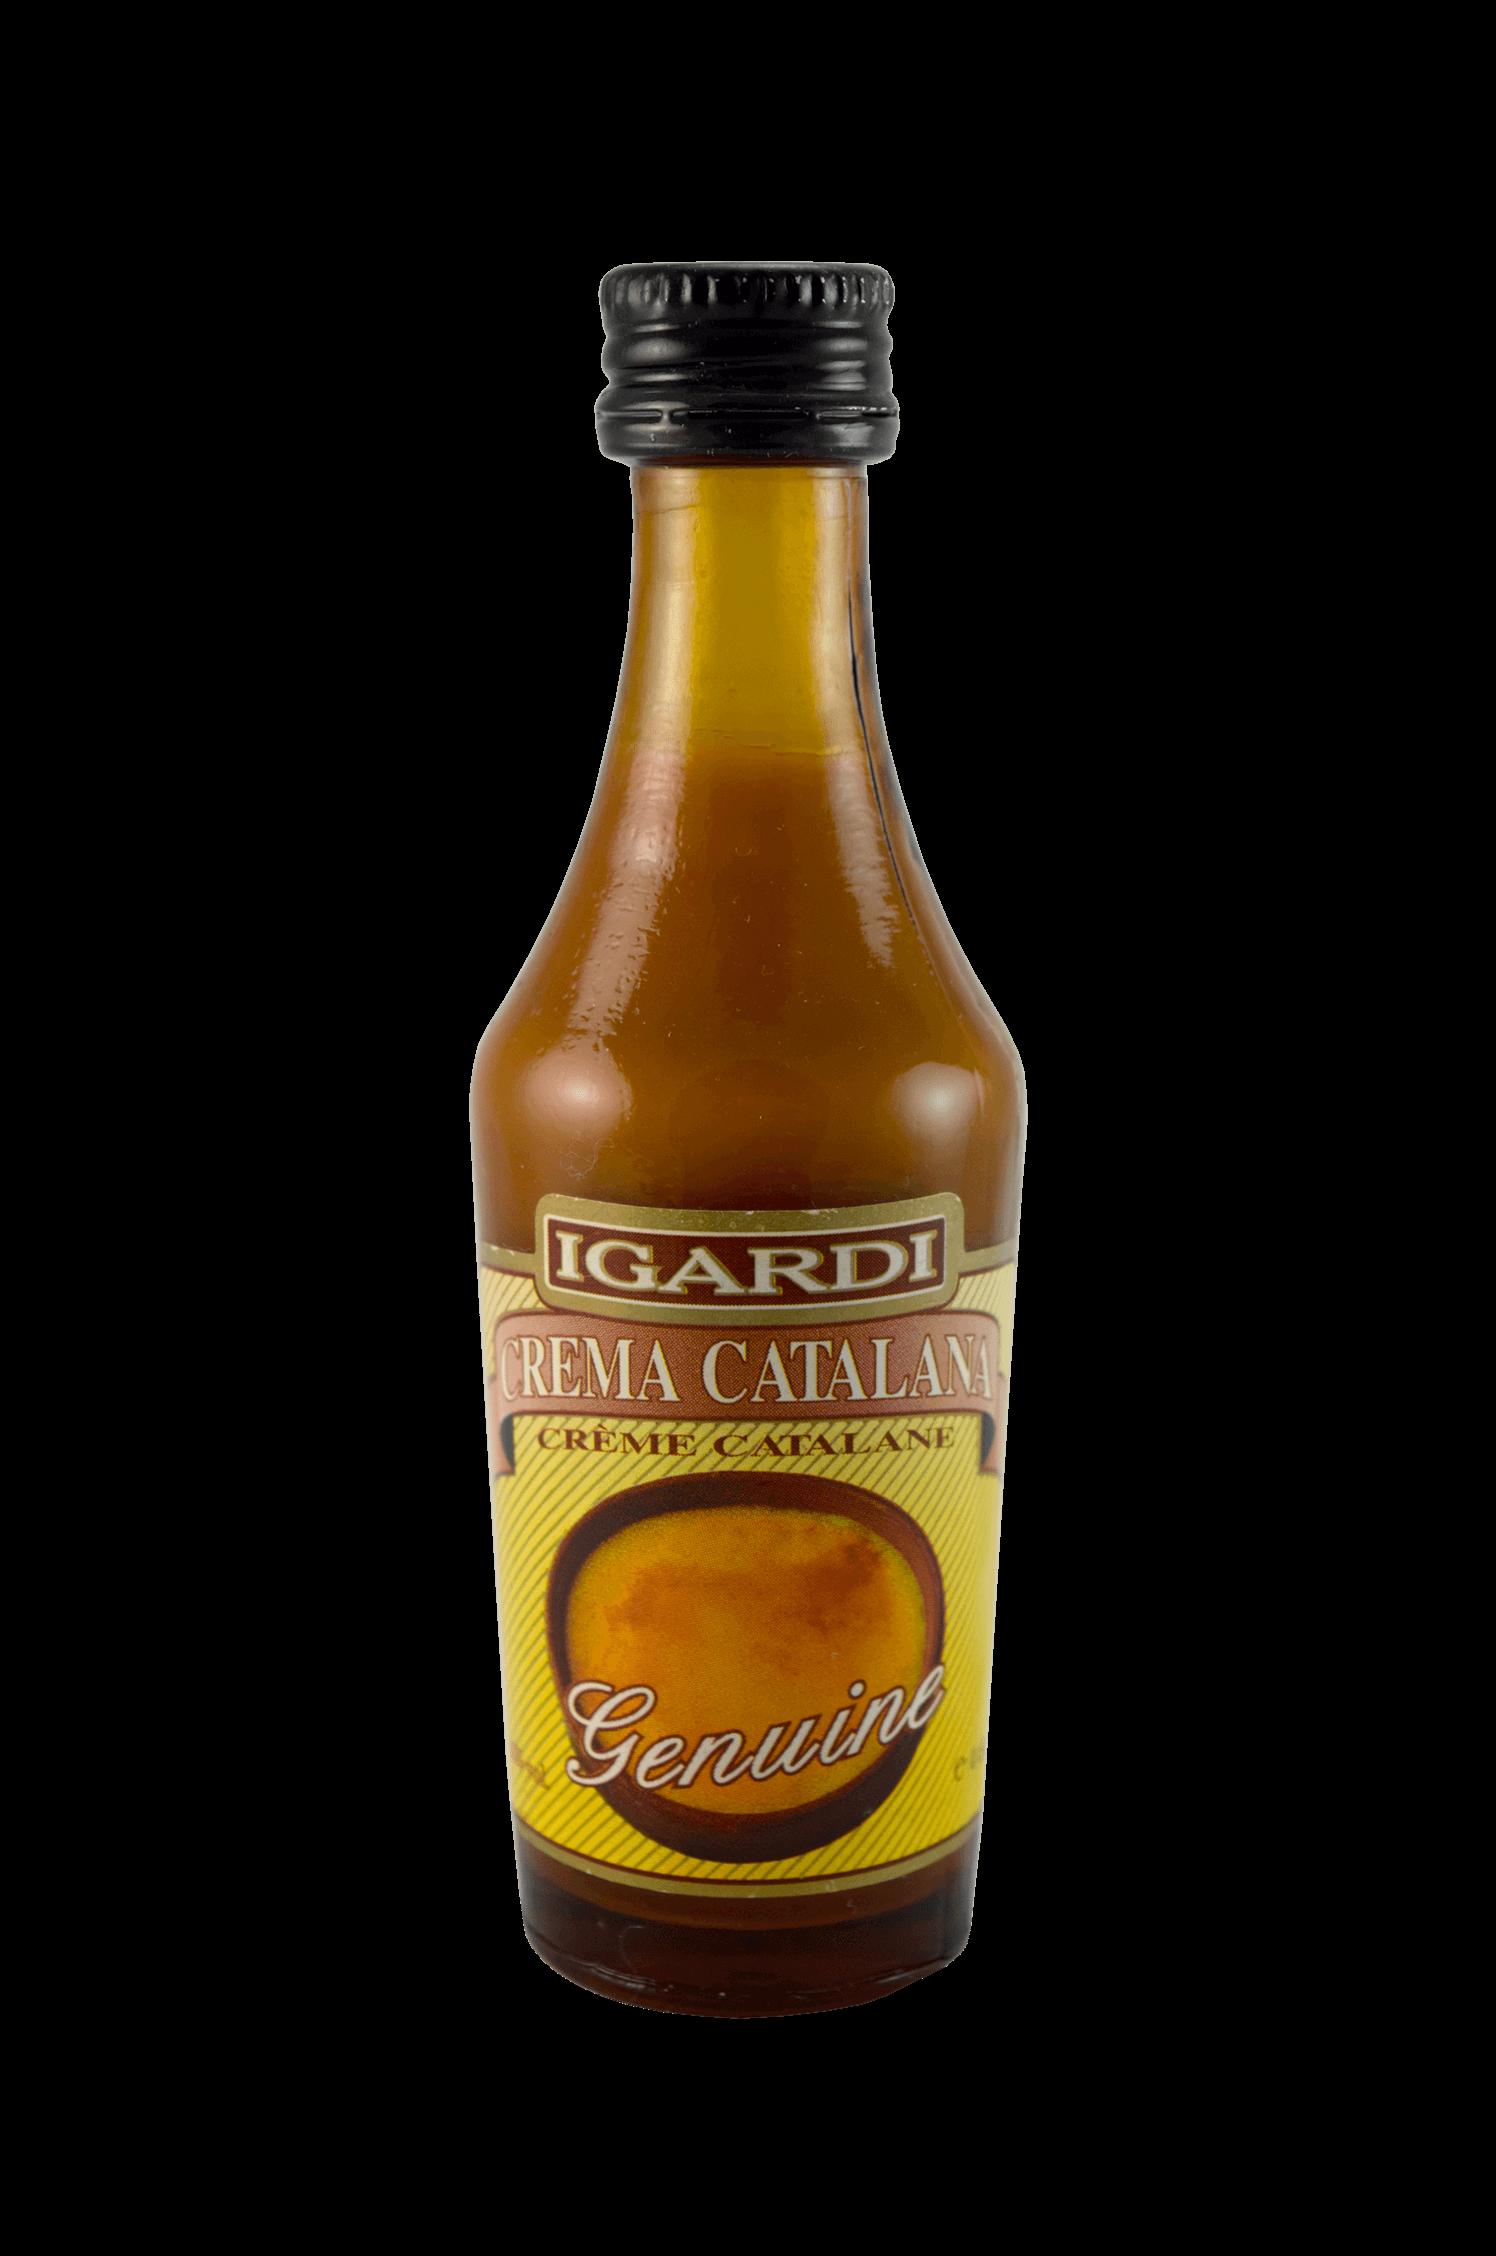 Igardi Crema Catalana